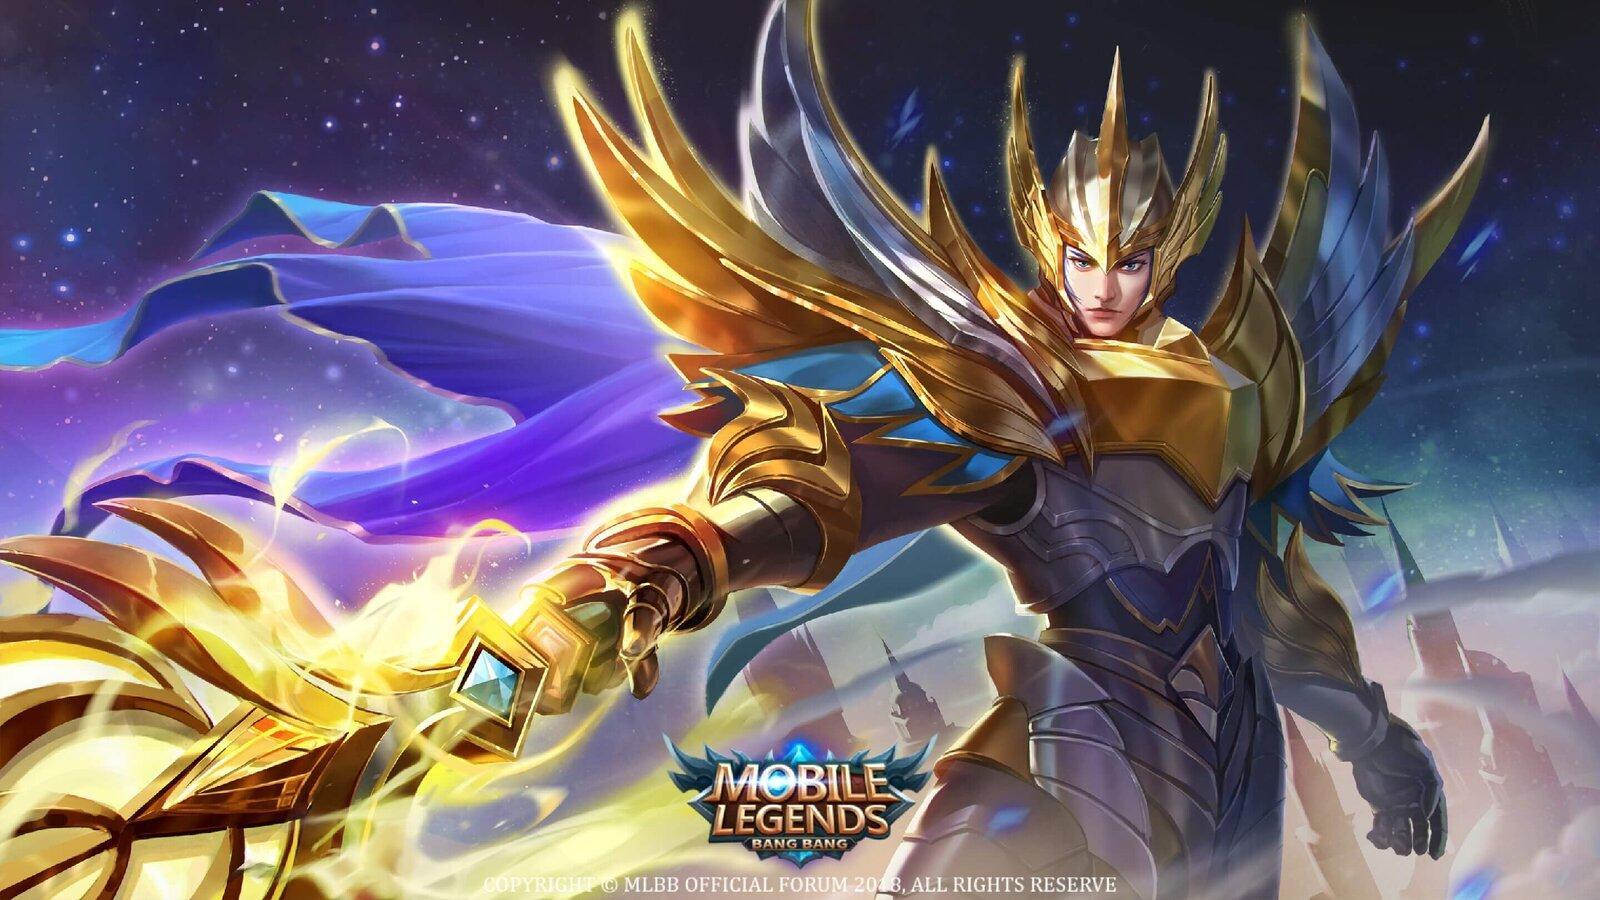 Hero Mobile Legend Hd Wallpapers - Wallpaper Cave